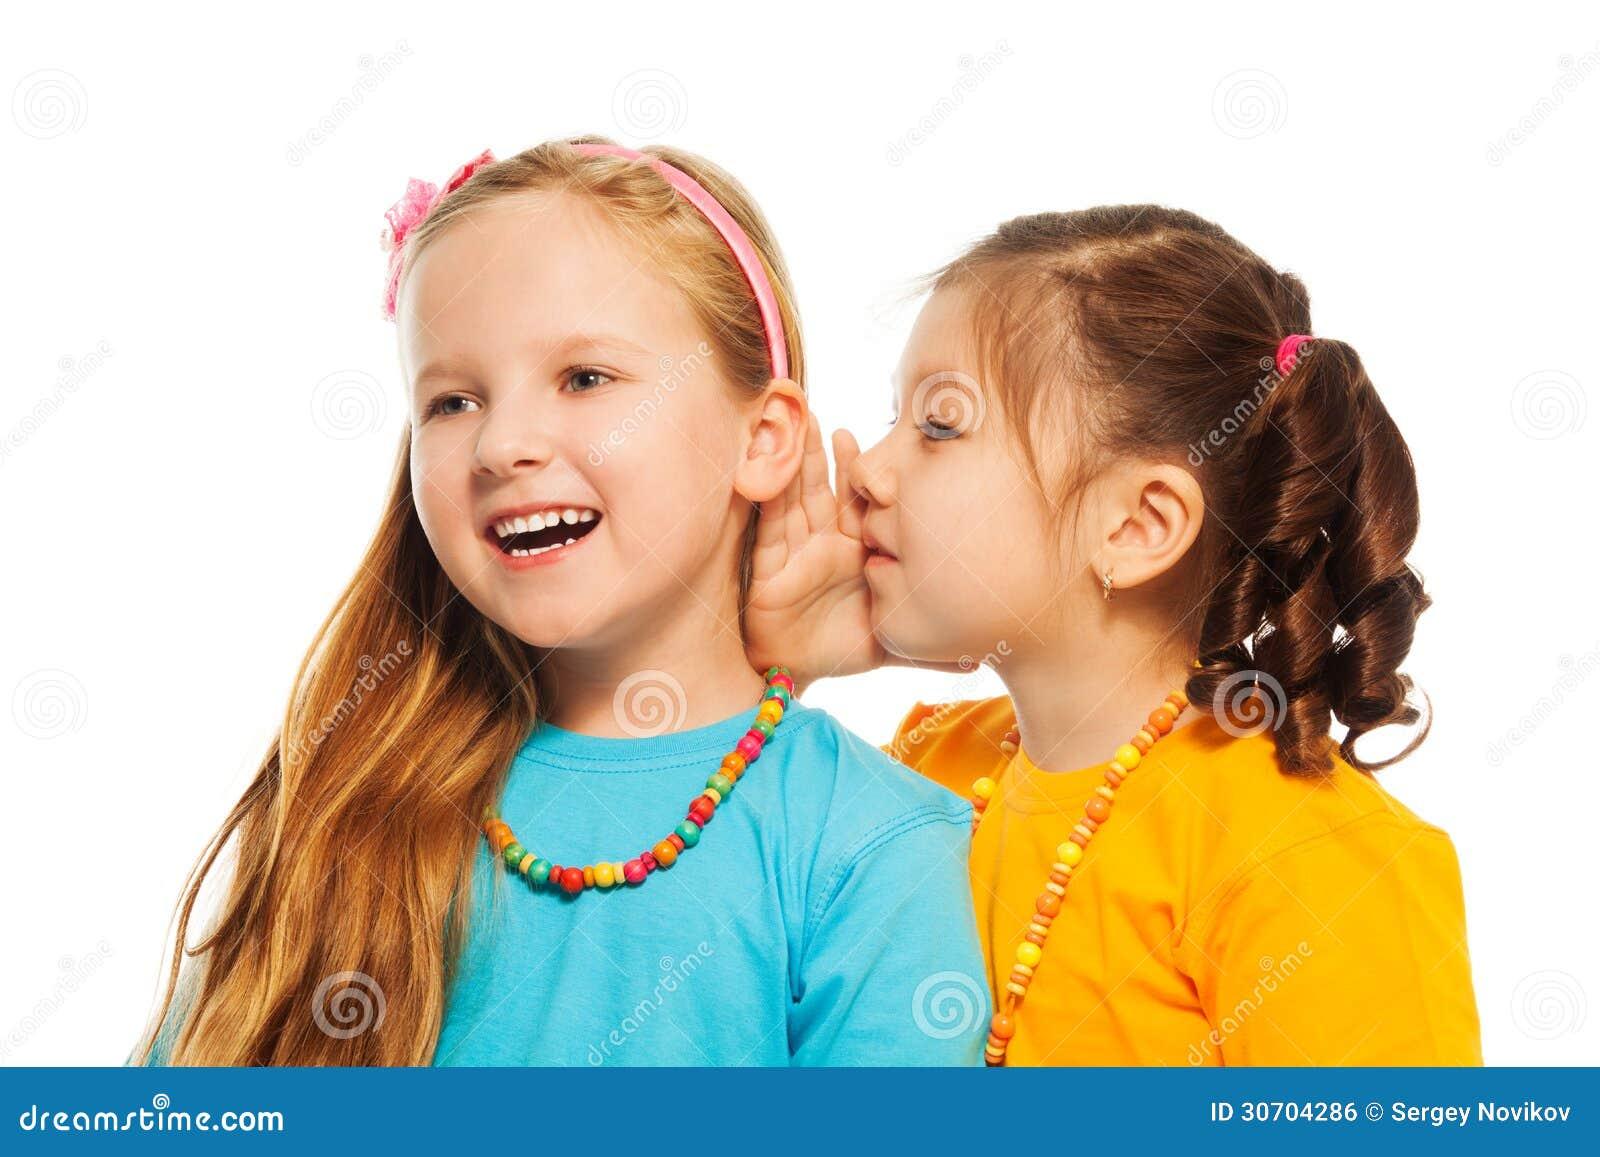 little gossip girls royalty free stock image